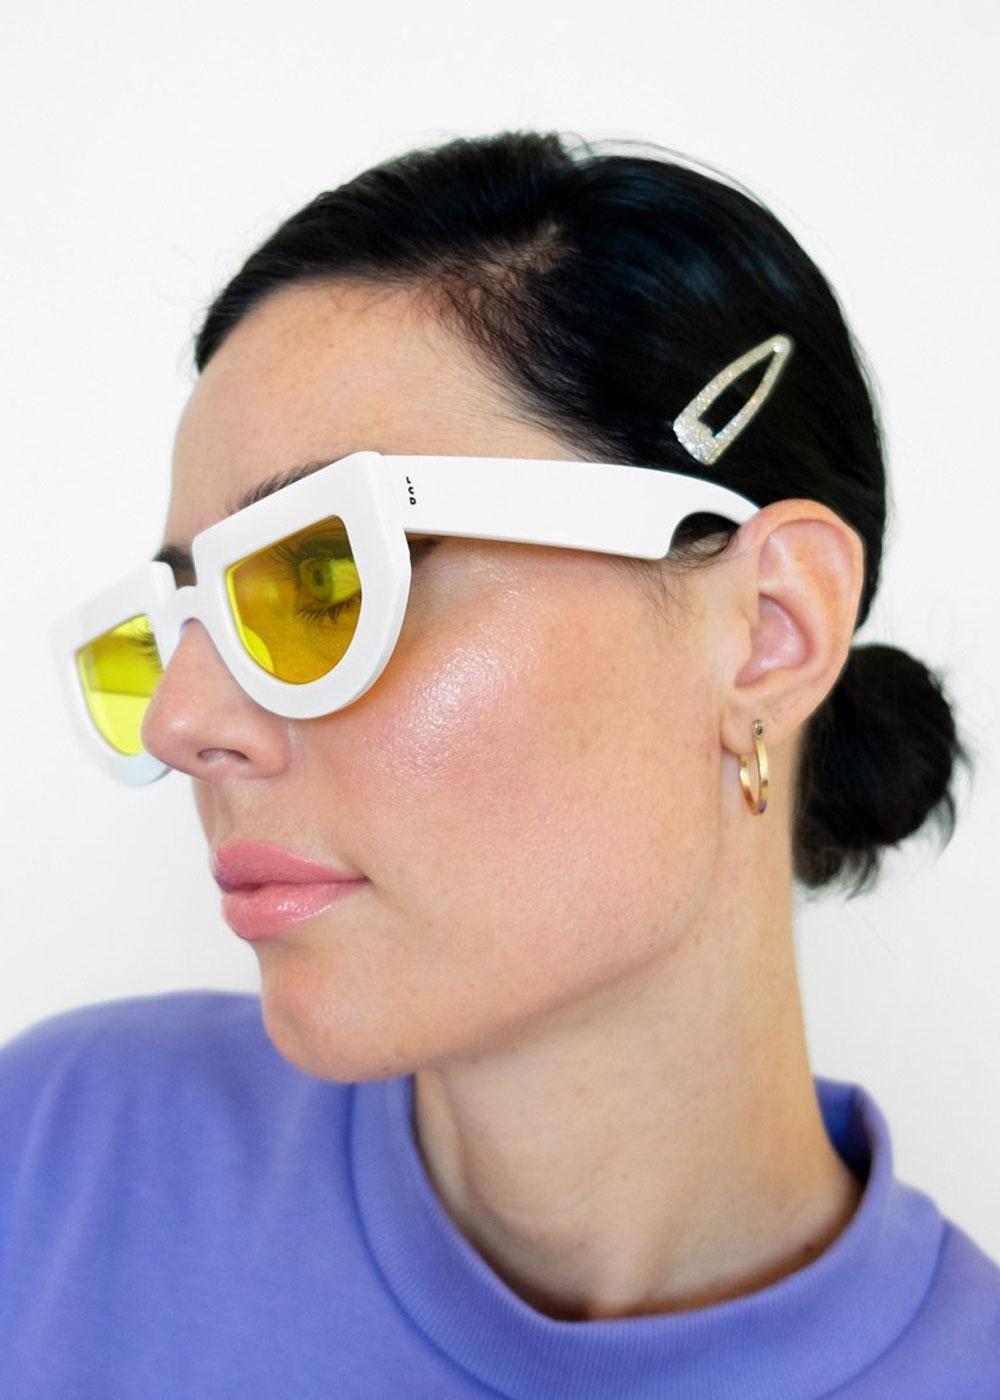 LCDglasses_yellow1.